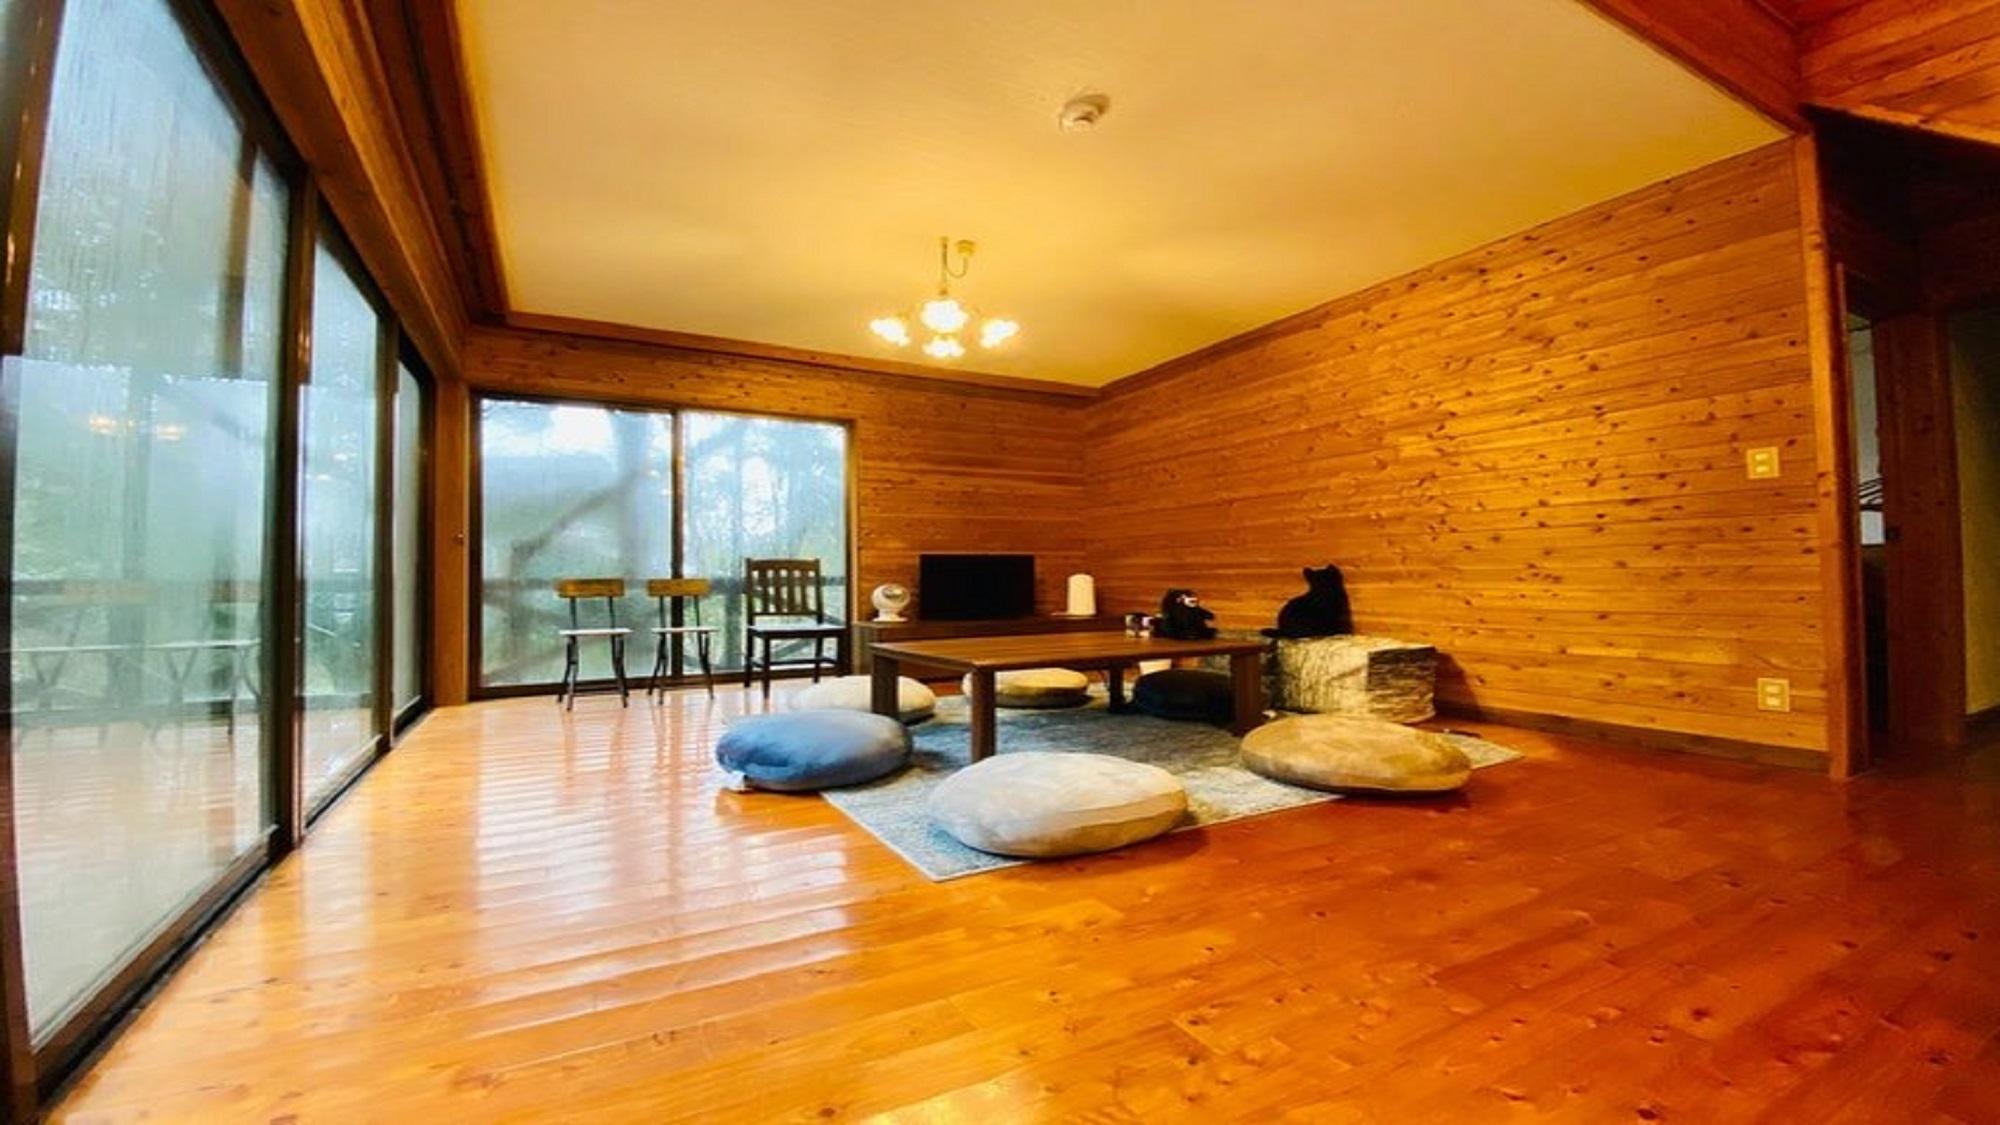 Aso Lodge Otohime -1棟貸切 グループ&ファミリ【Vacation STAY提供】